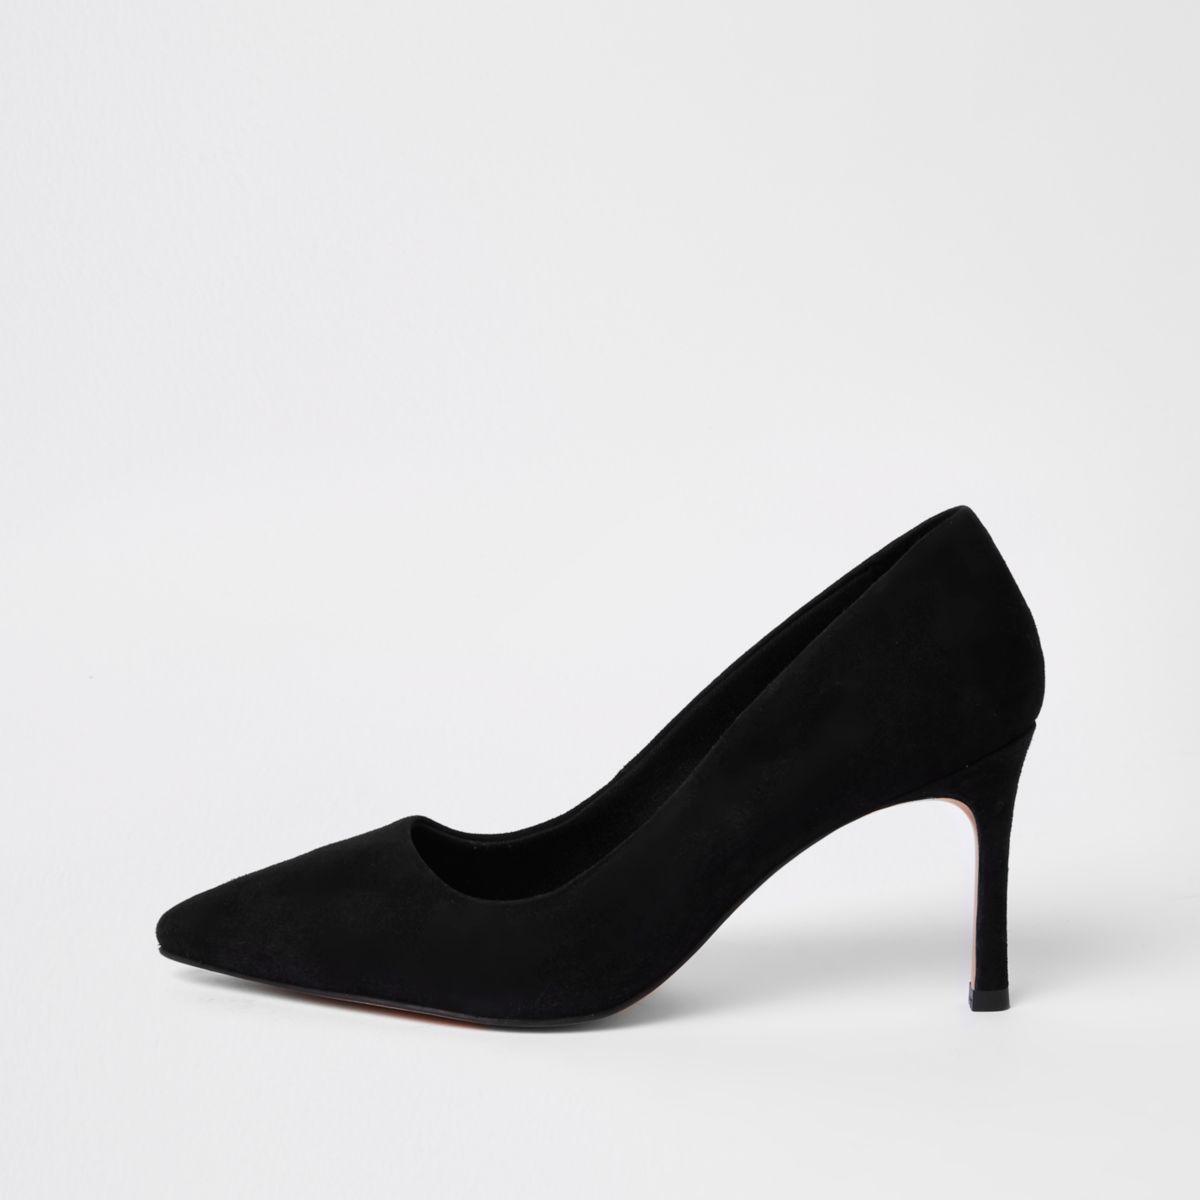 Black suede pointed pumps